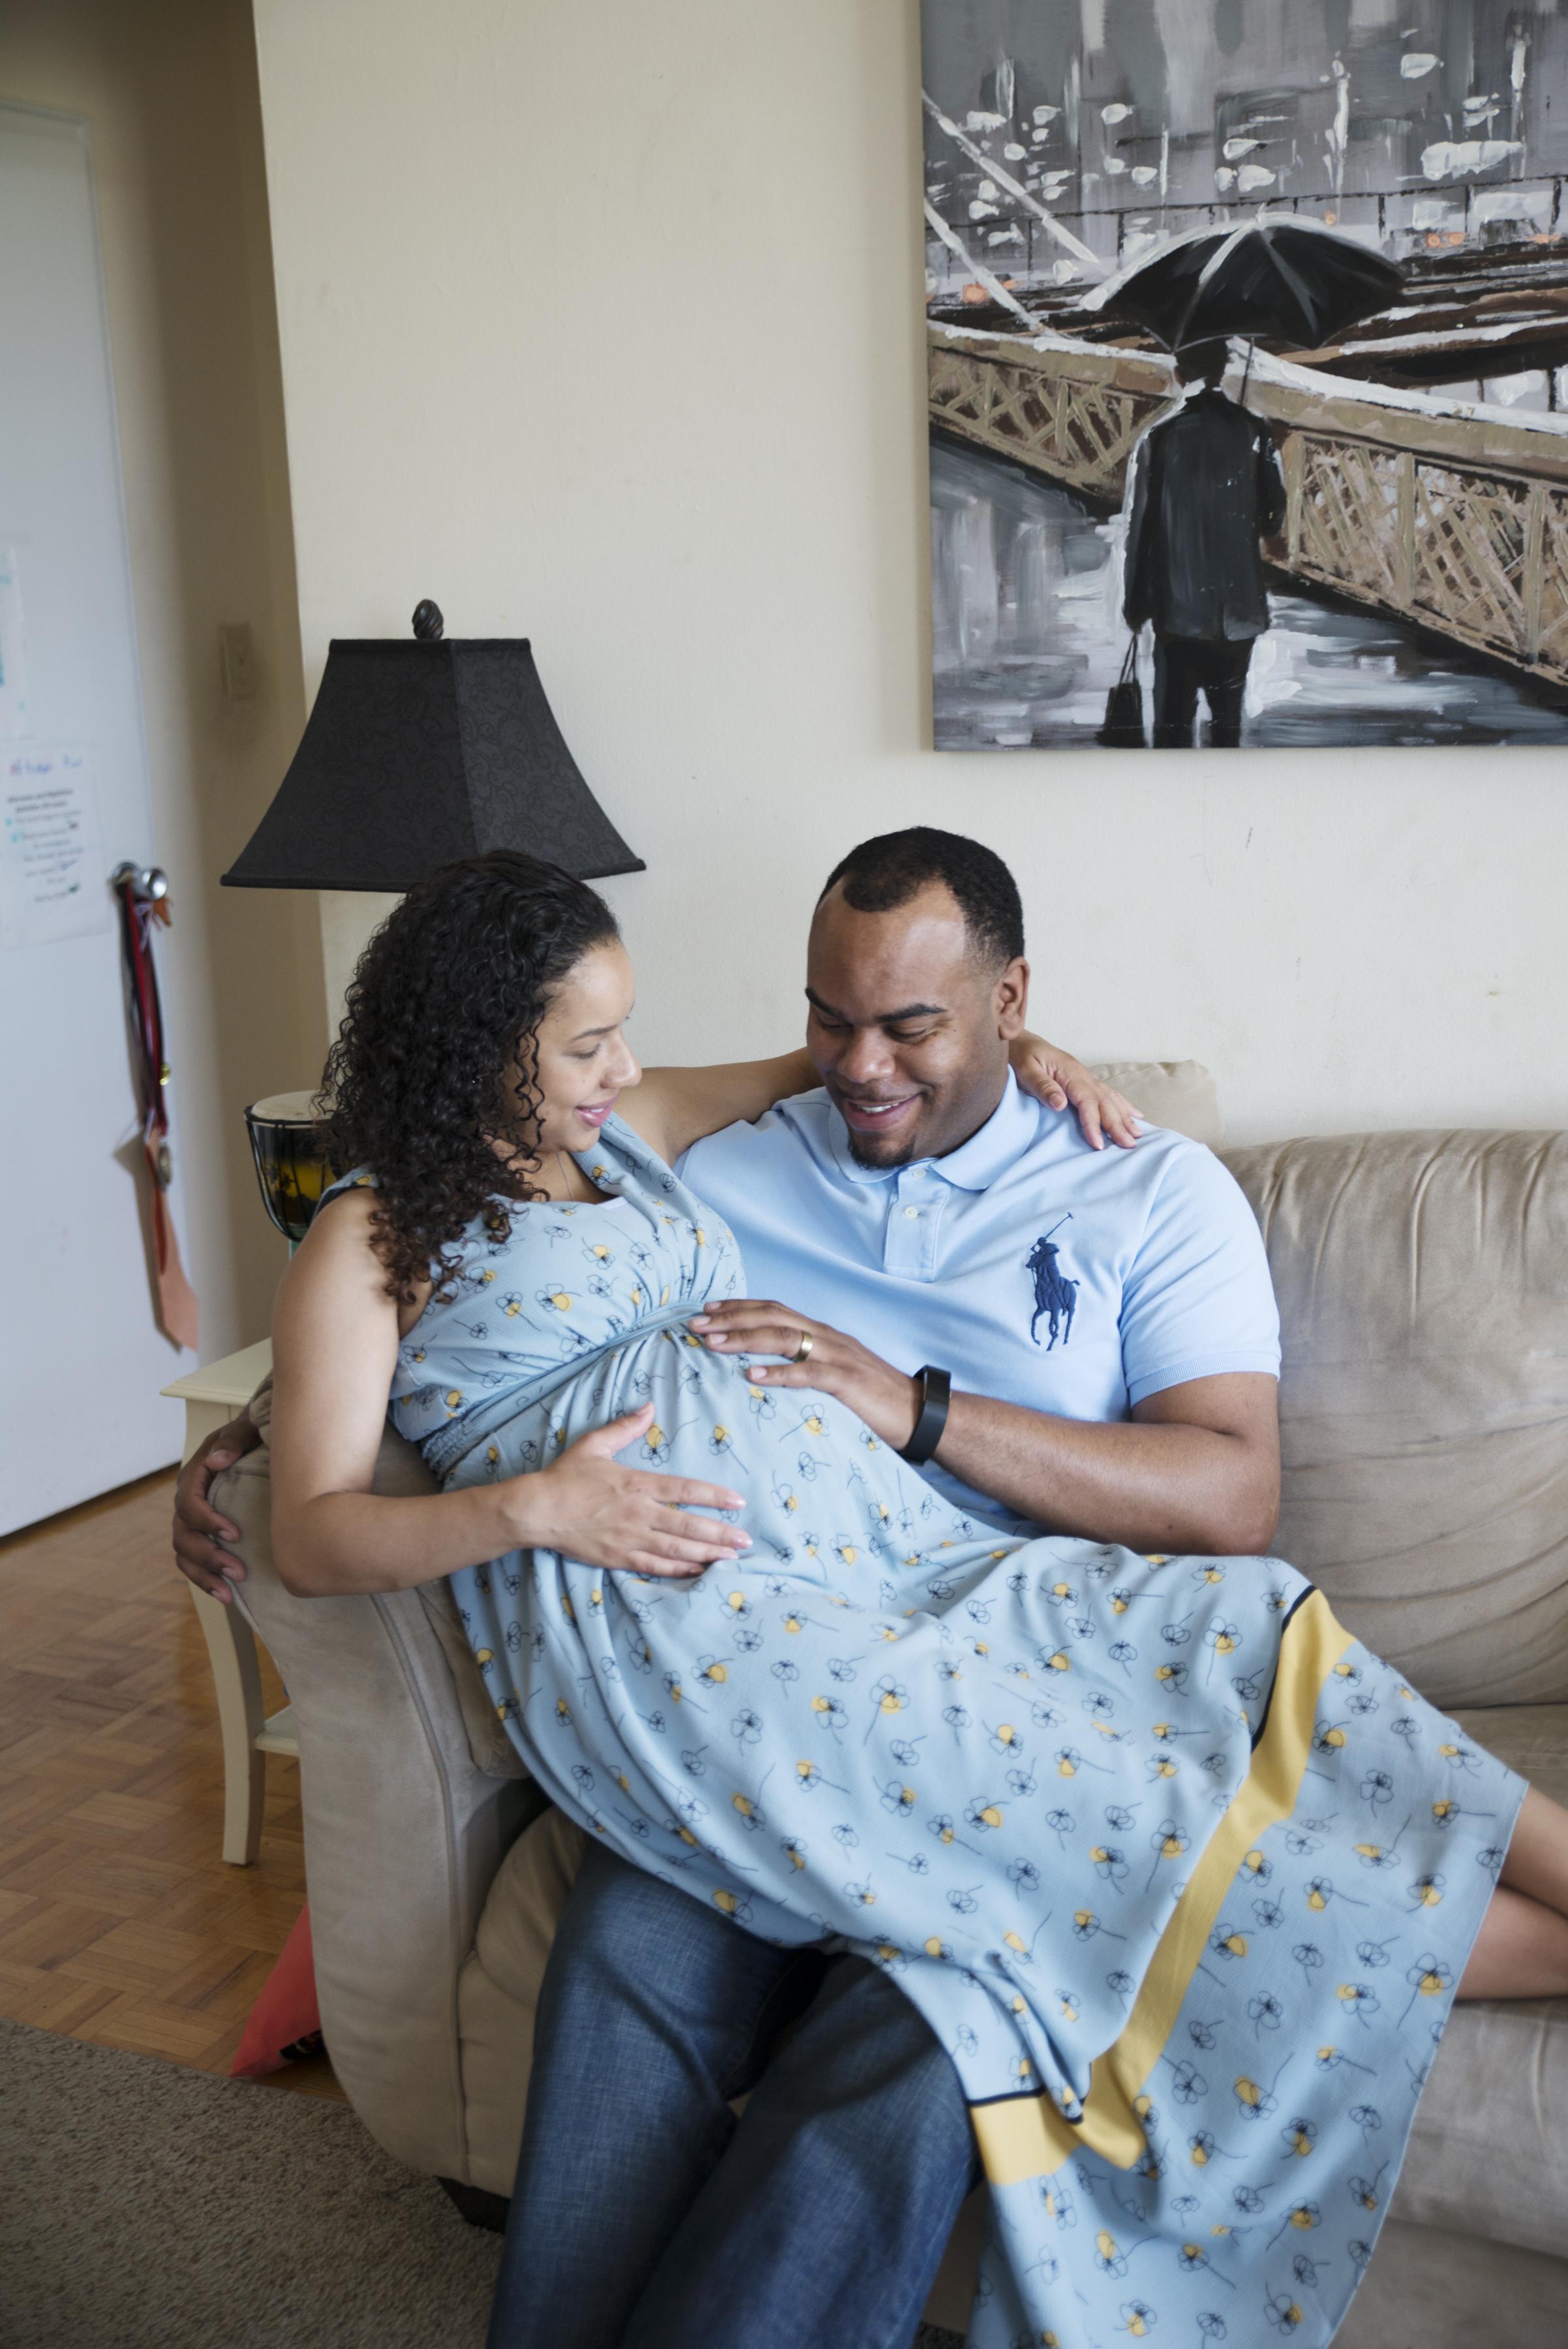 Steph-Maternity-2.JPG